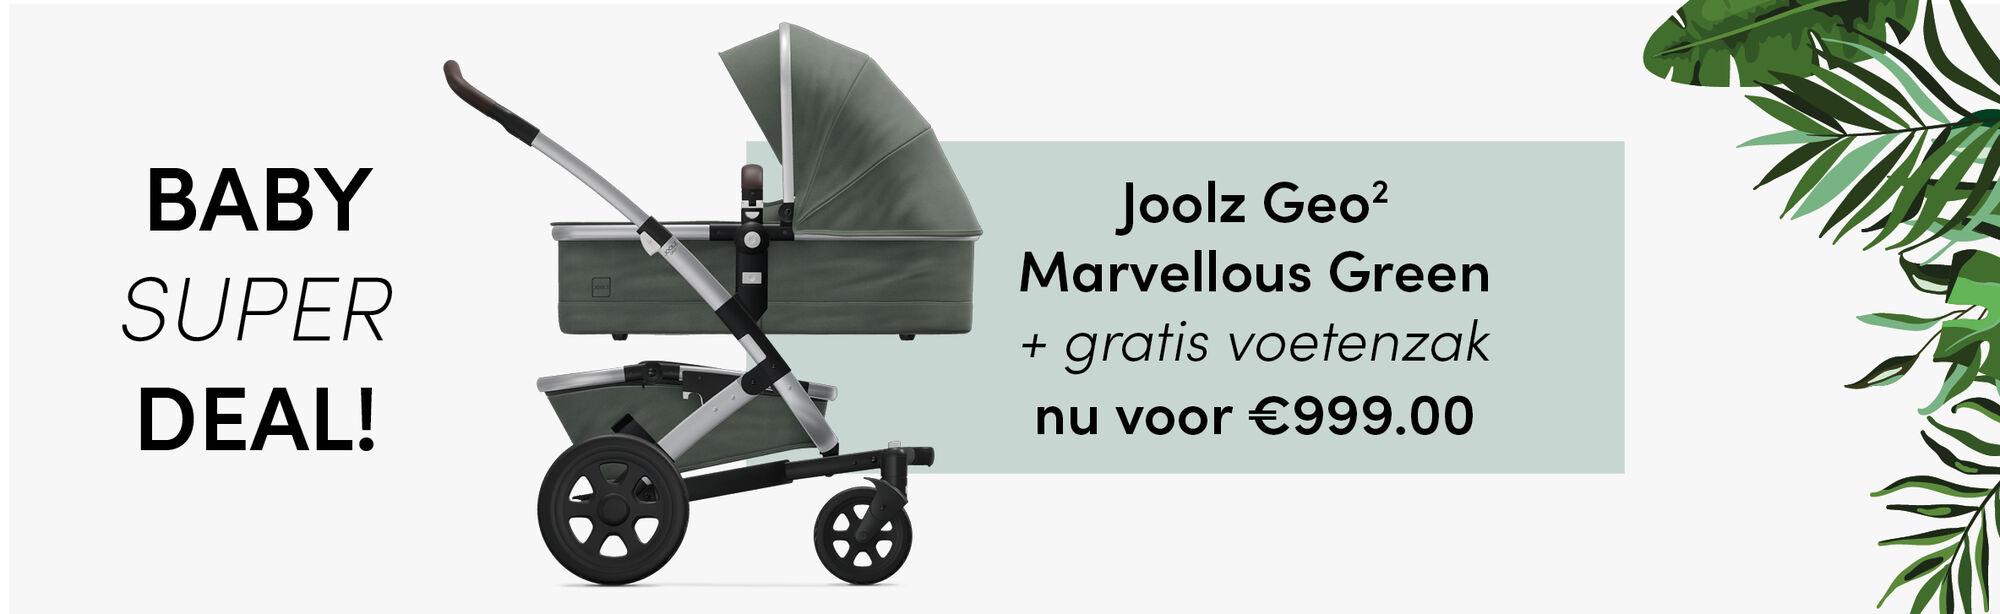 Joolz Geo2 Marvellous Green